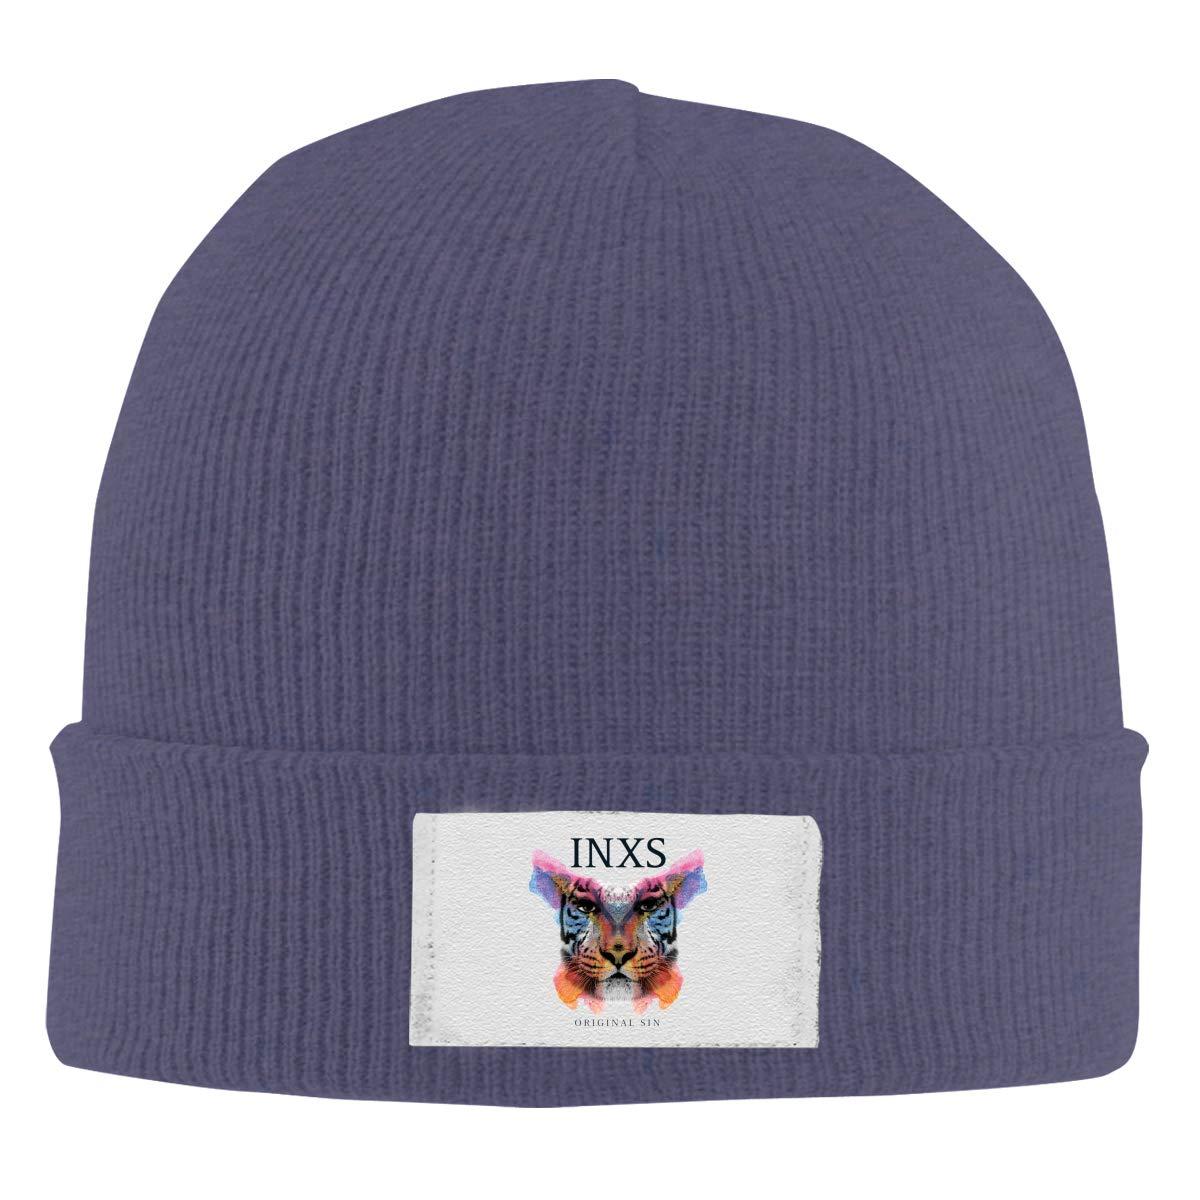 Stretchy Cuff Beanie Hat Black Skull Caps INXS Original Sin Winter Warm Knit Hats